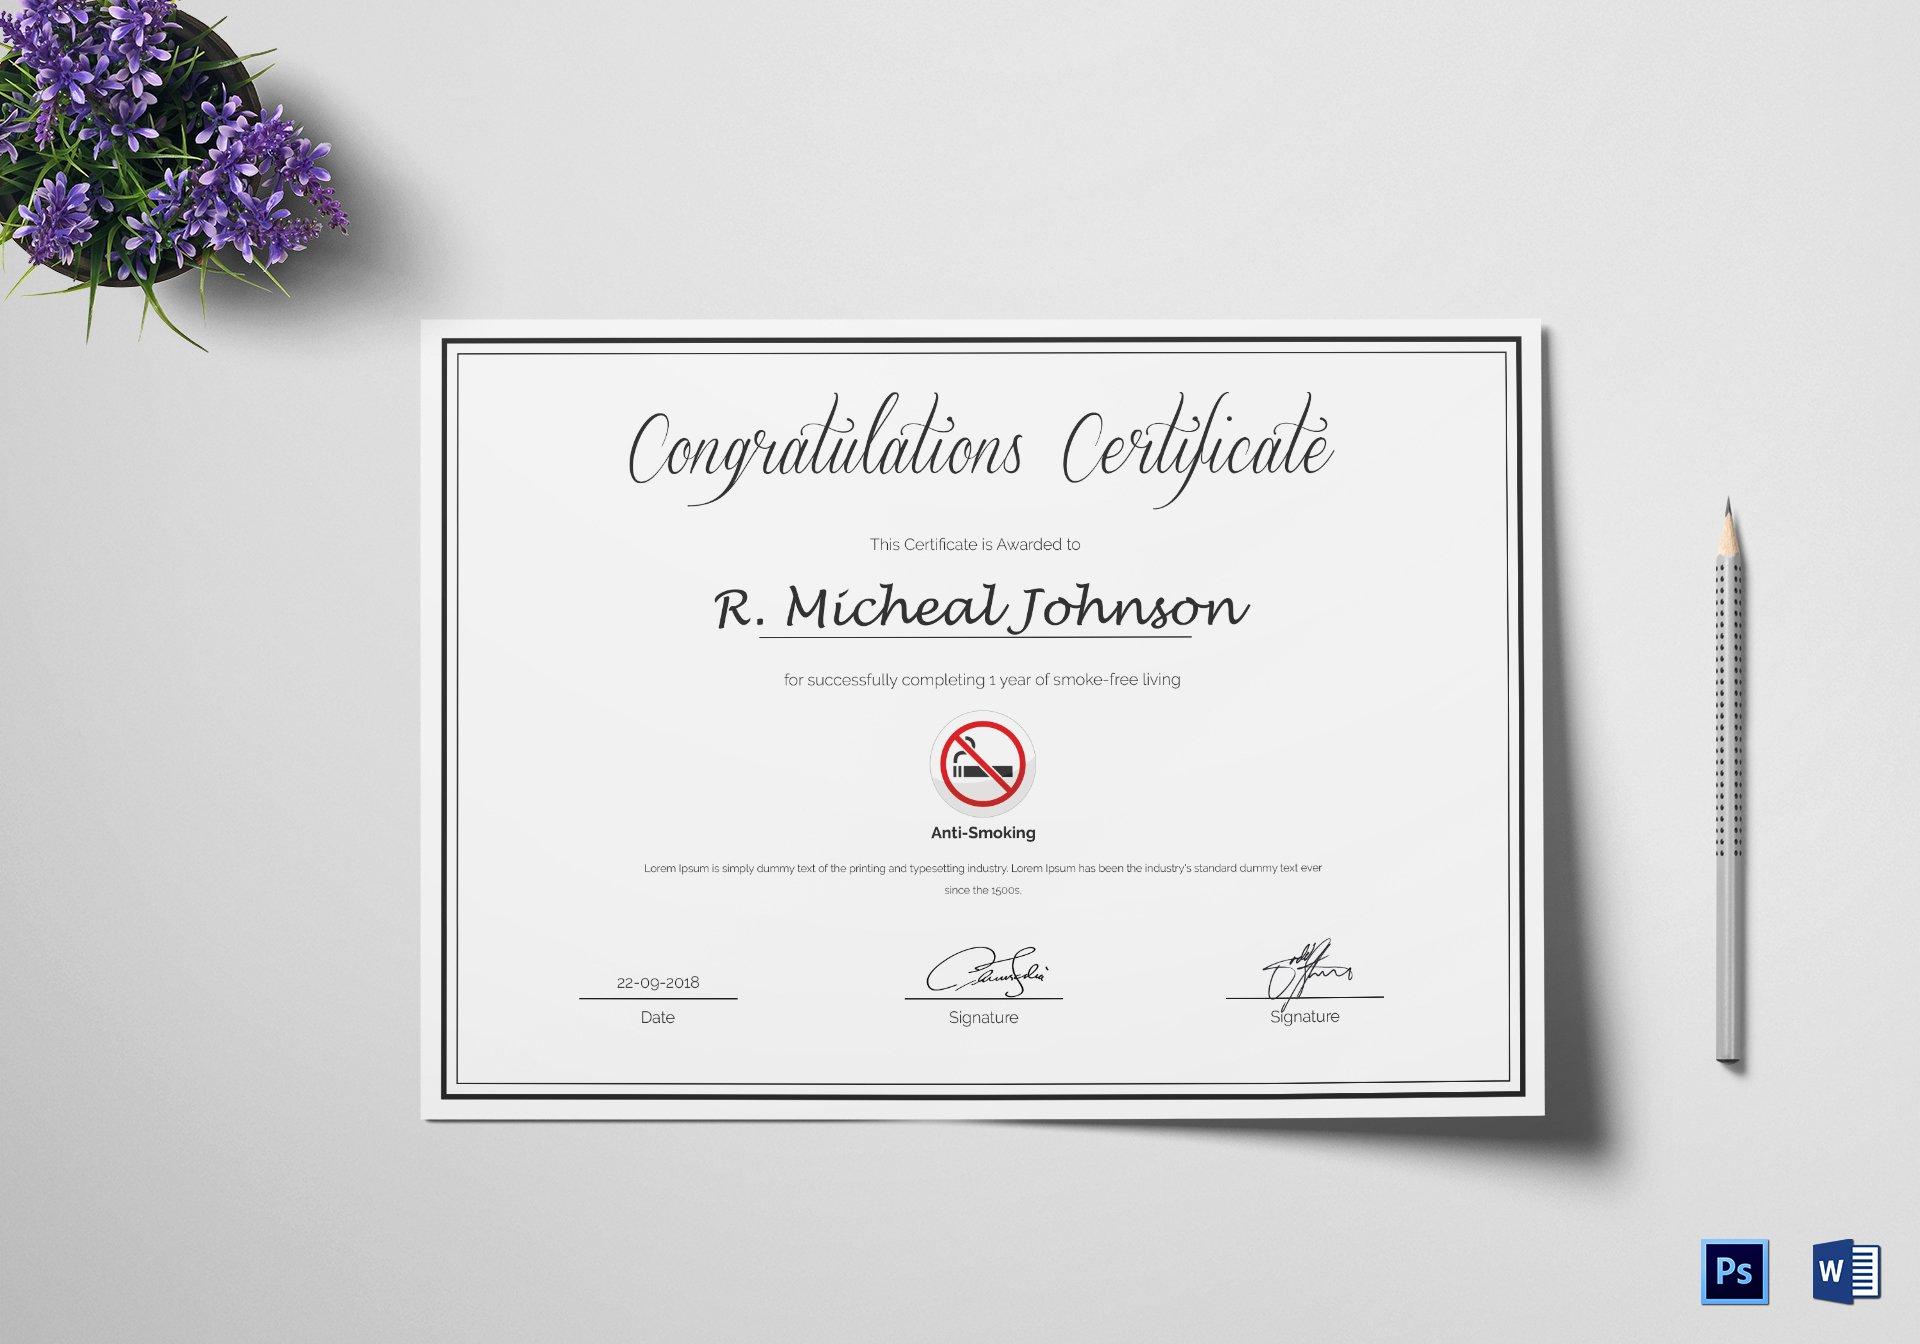 Congratulation Certificate Template Word Best Of Certificate Of Congratulations for Quitting Smoking Design